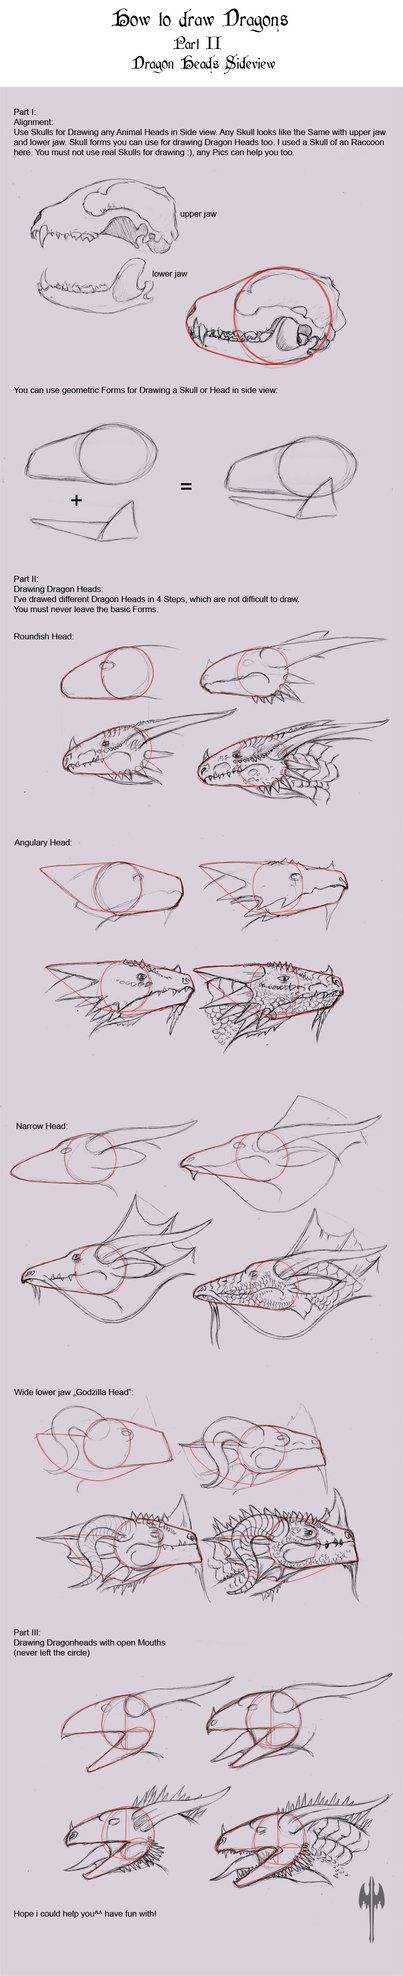 Dragon Digital Painting   Dragones   Pinterest   Dragones, Dibujo y ...